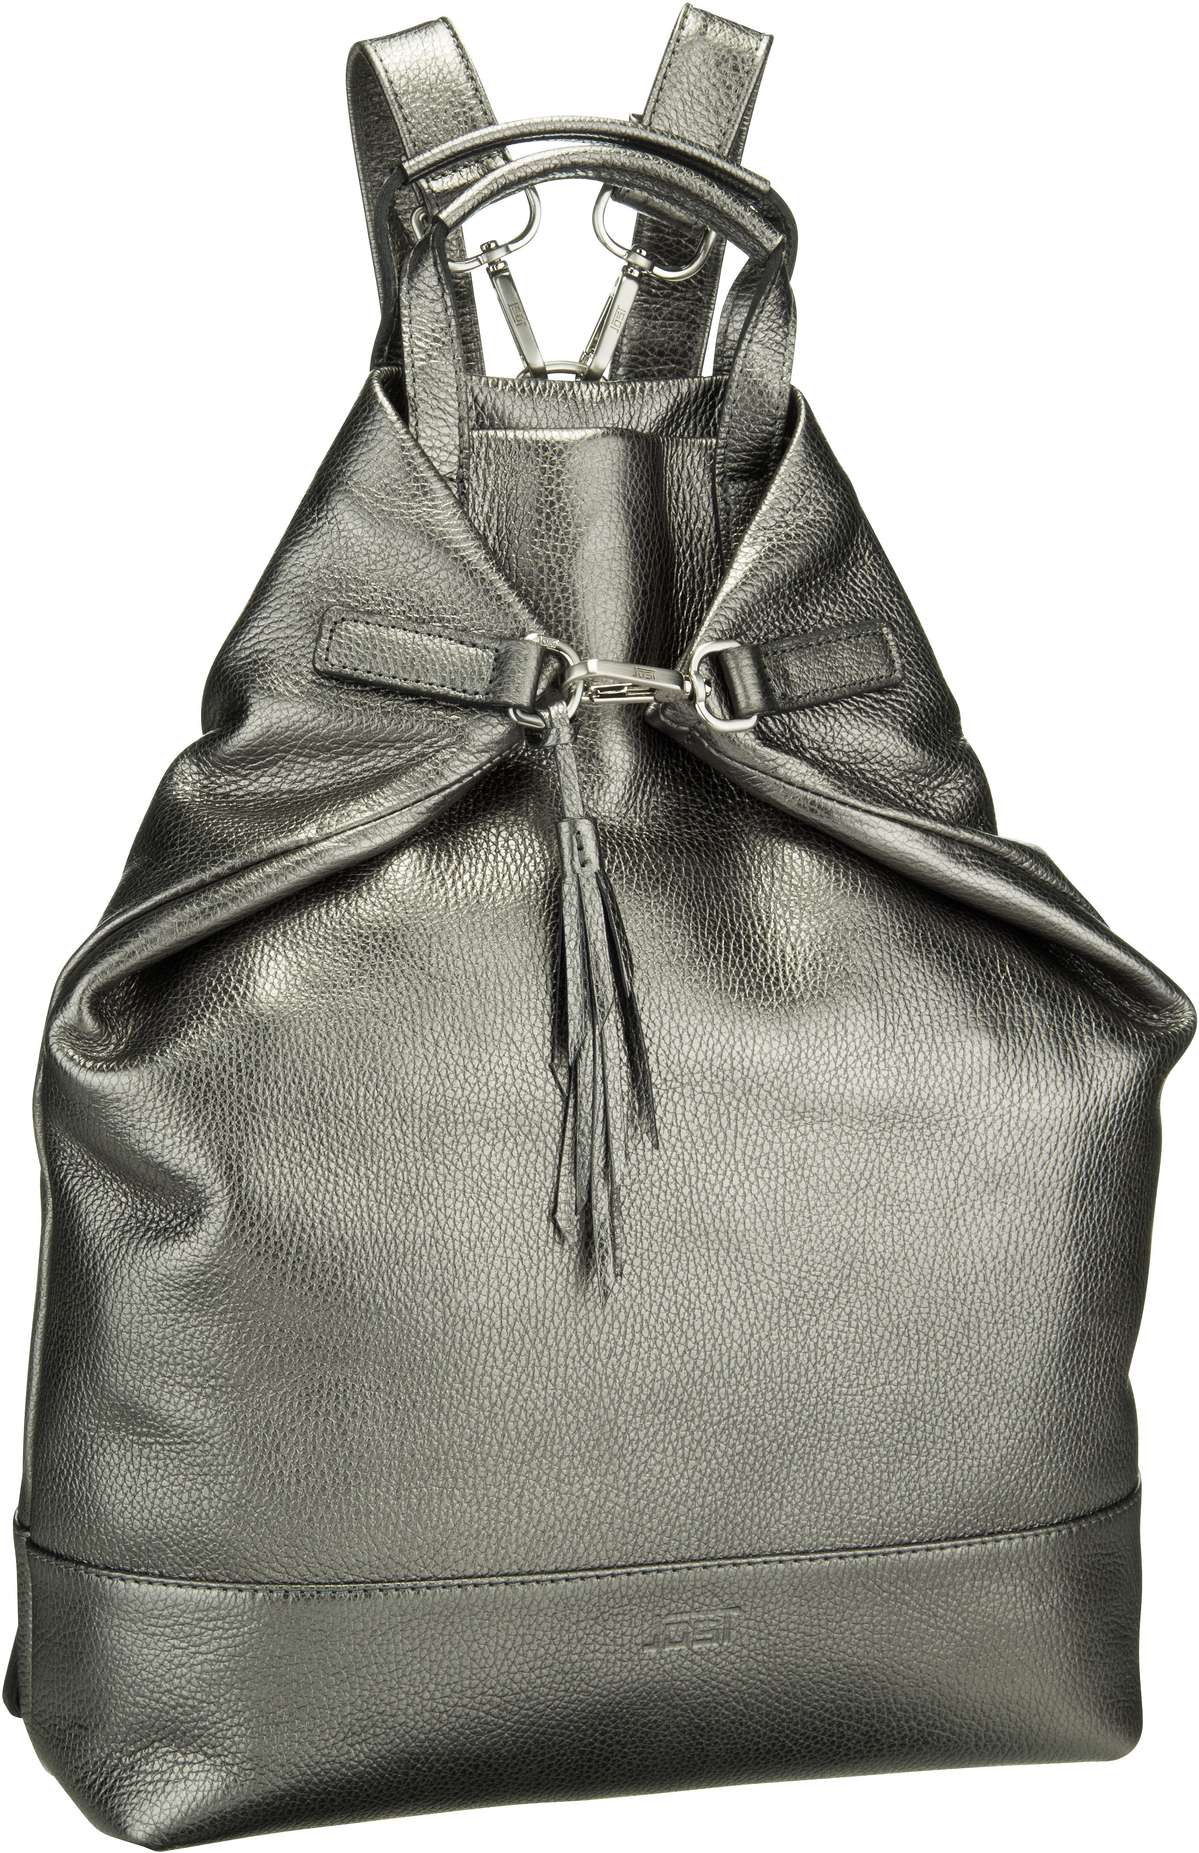 Rucksack / Daypack Vika 1839 X-Change Bag 3in1 M Silver